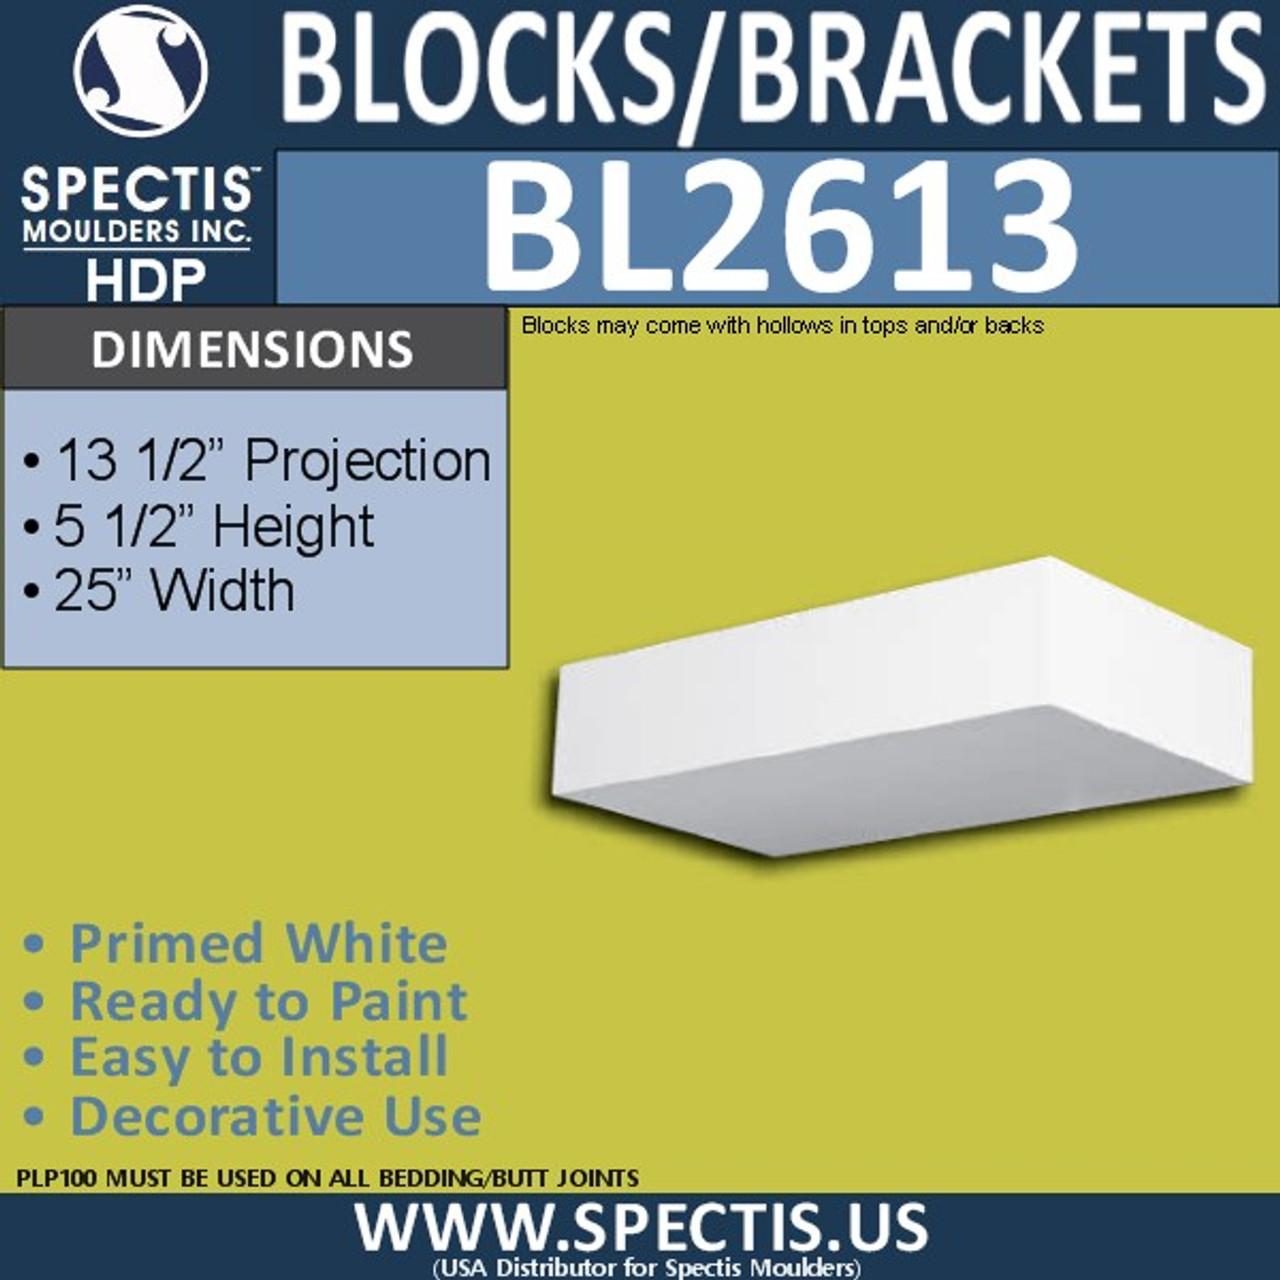 "BL2613 Eave Block or Bracket 13.5""W x 5.5""H x 25"" P"